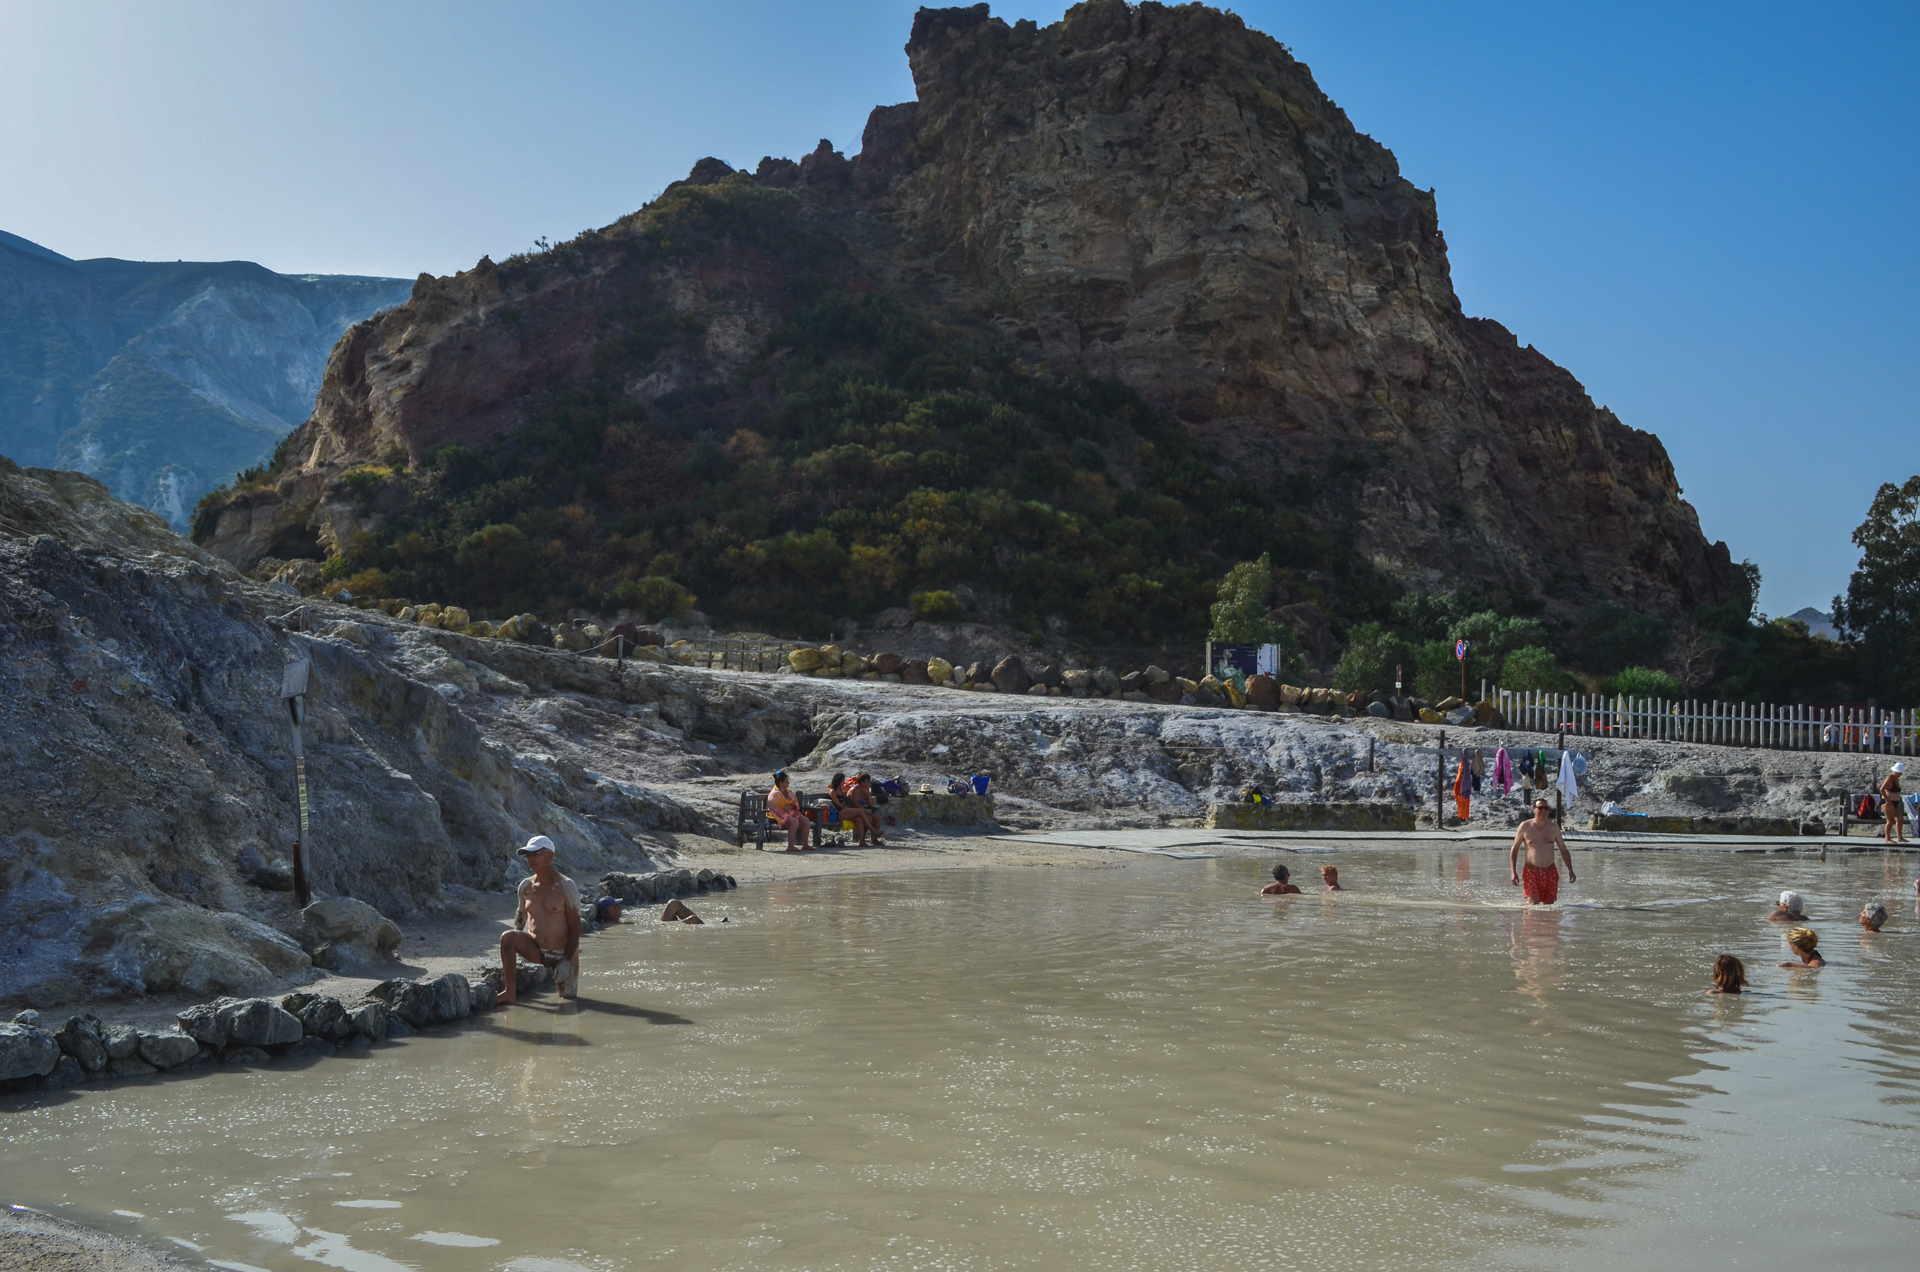 Aeolian islands travel guide, Terme di Vulcano, vulcano thermal baths, sulphur vulcano, hot springs vulcano, mud vulcano